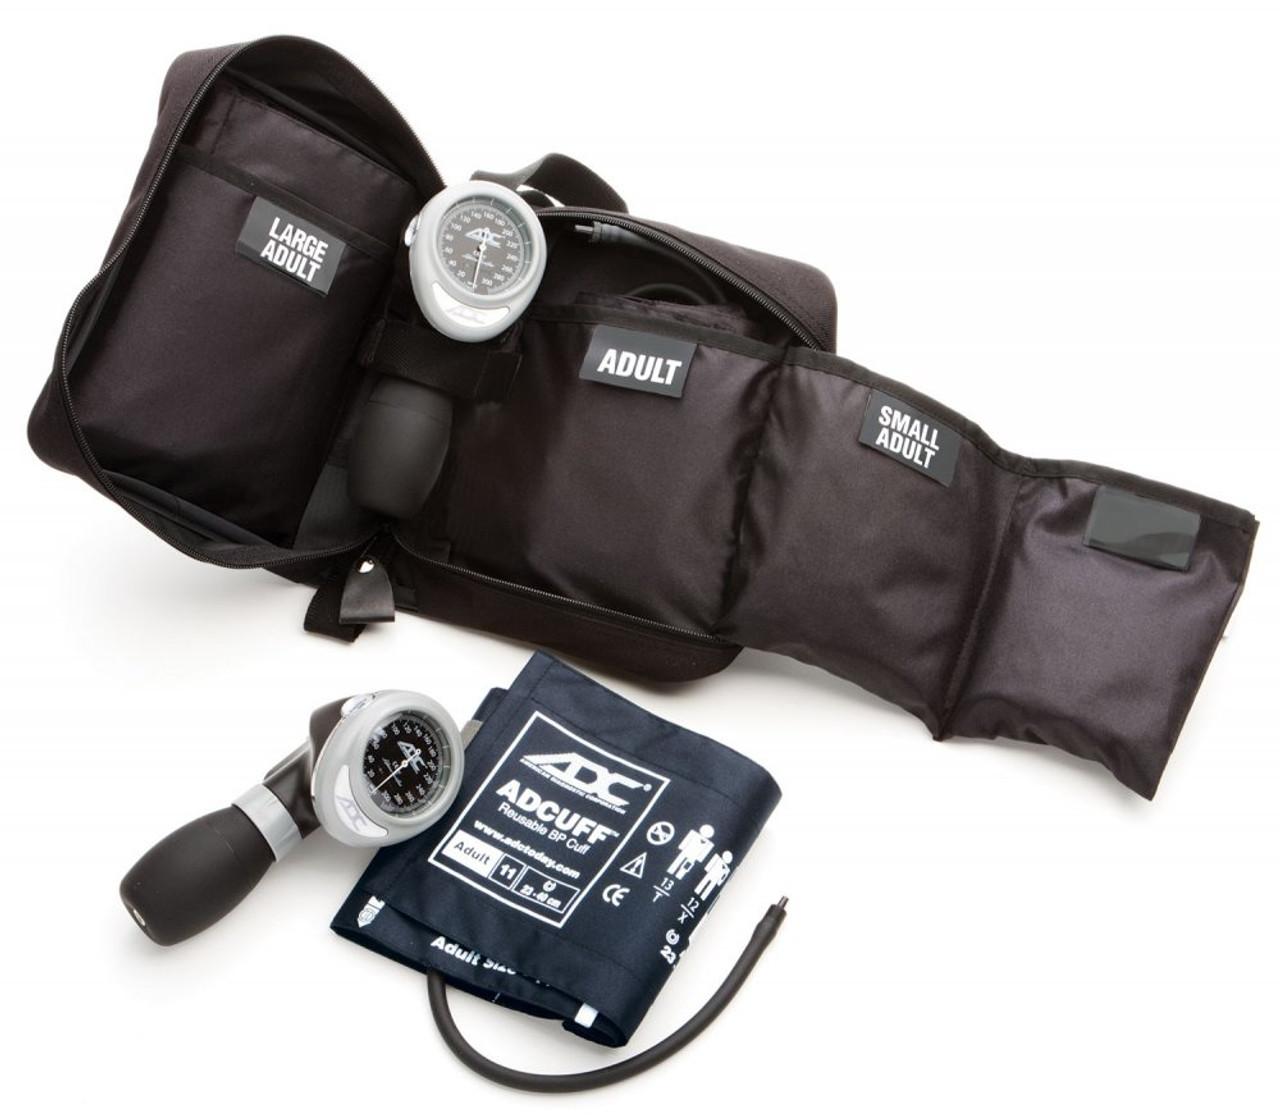 ADC 731 Multikuf™ Portable 3 Cuff Sphyg - Navy